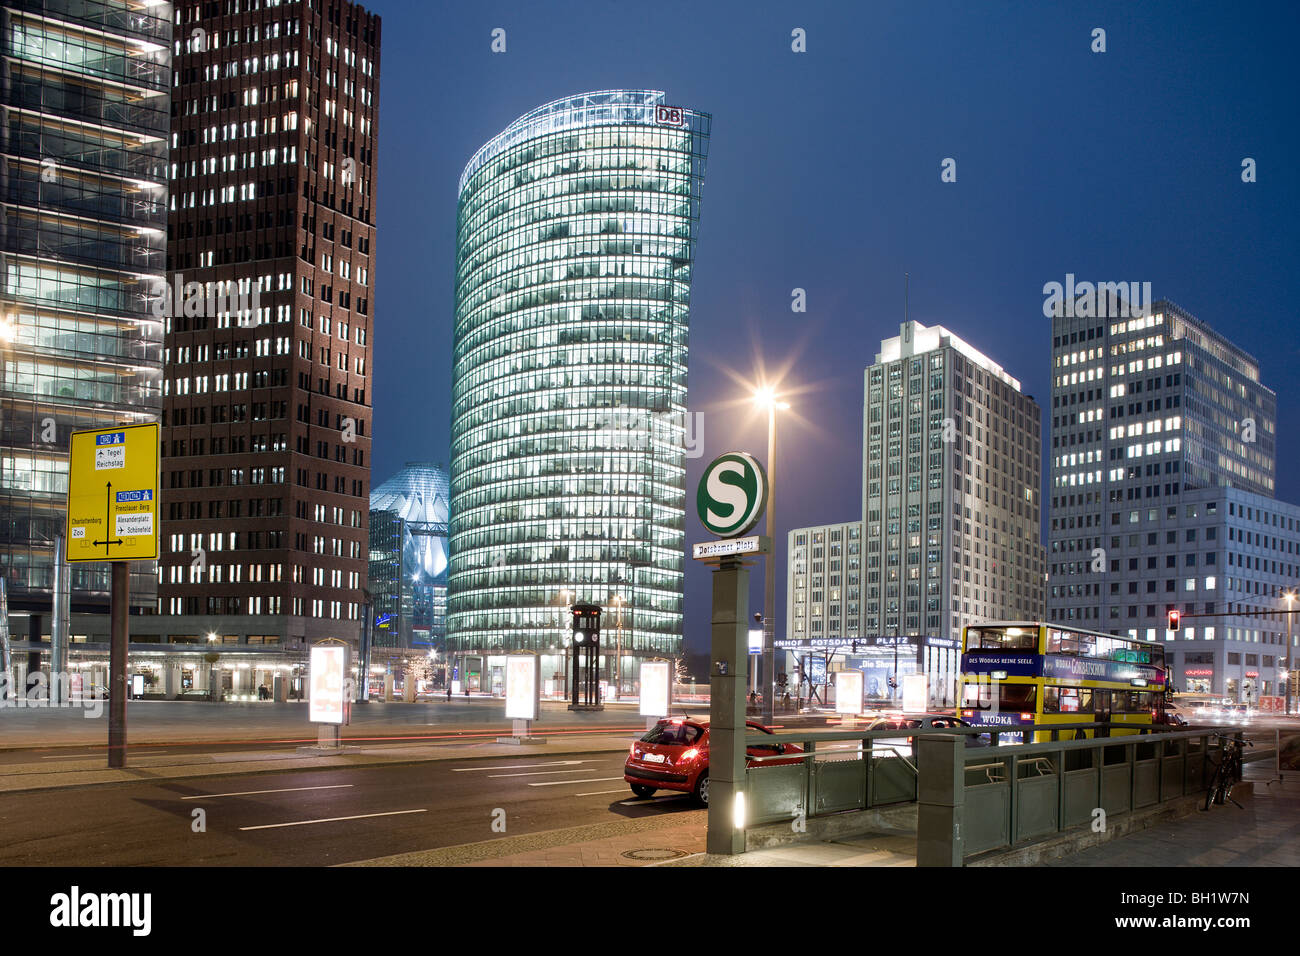 Potsdamer Platz from left to right Renzo Piano Tower, Hans Kollhoff Tower, Sony Center, Bahn Tower, Beisheim Center - Stock Image